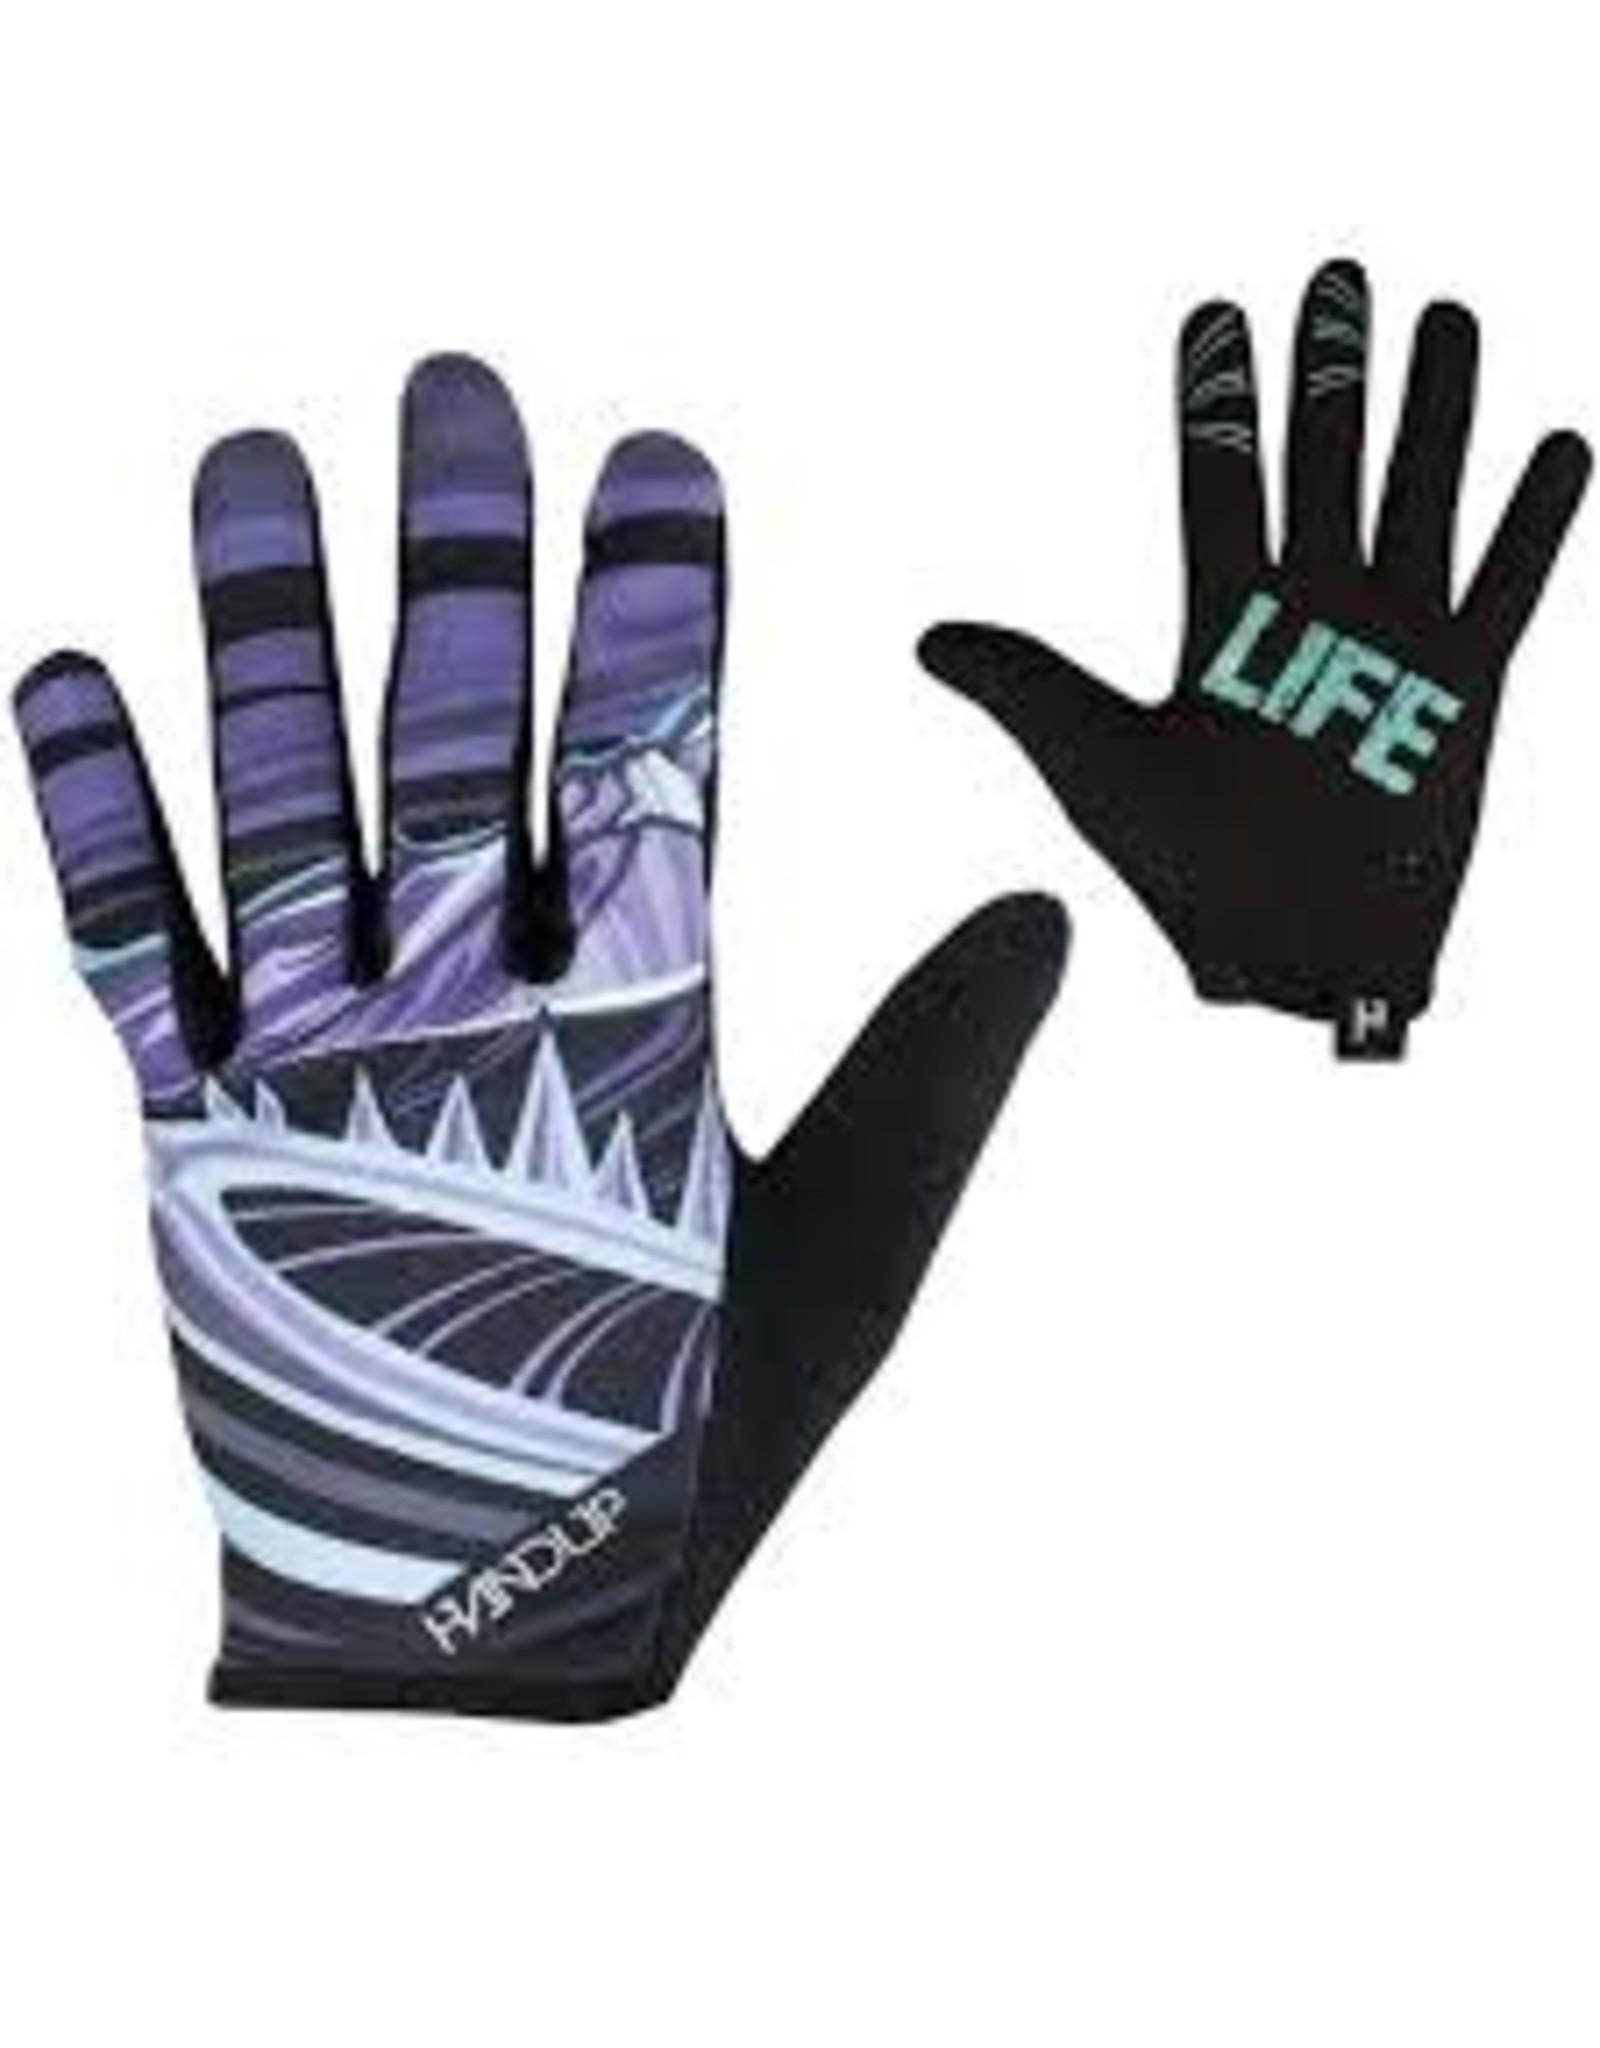 Glove Handup Mtn Life Teal/Grey XL